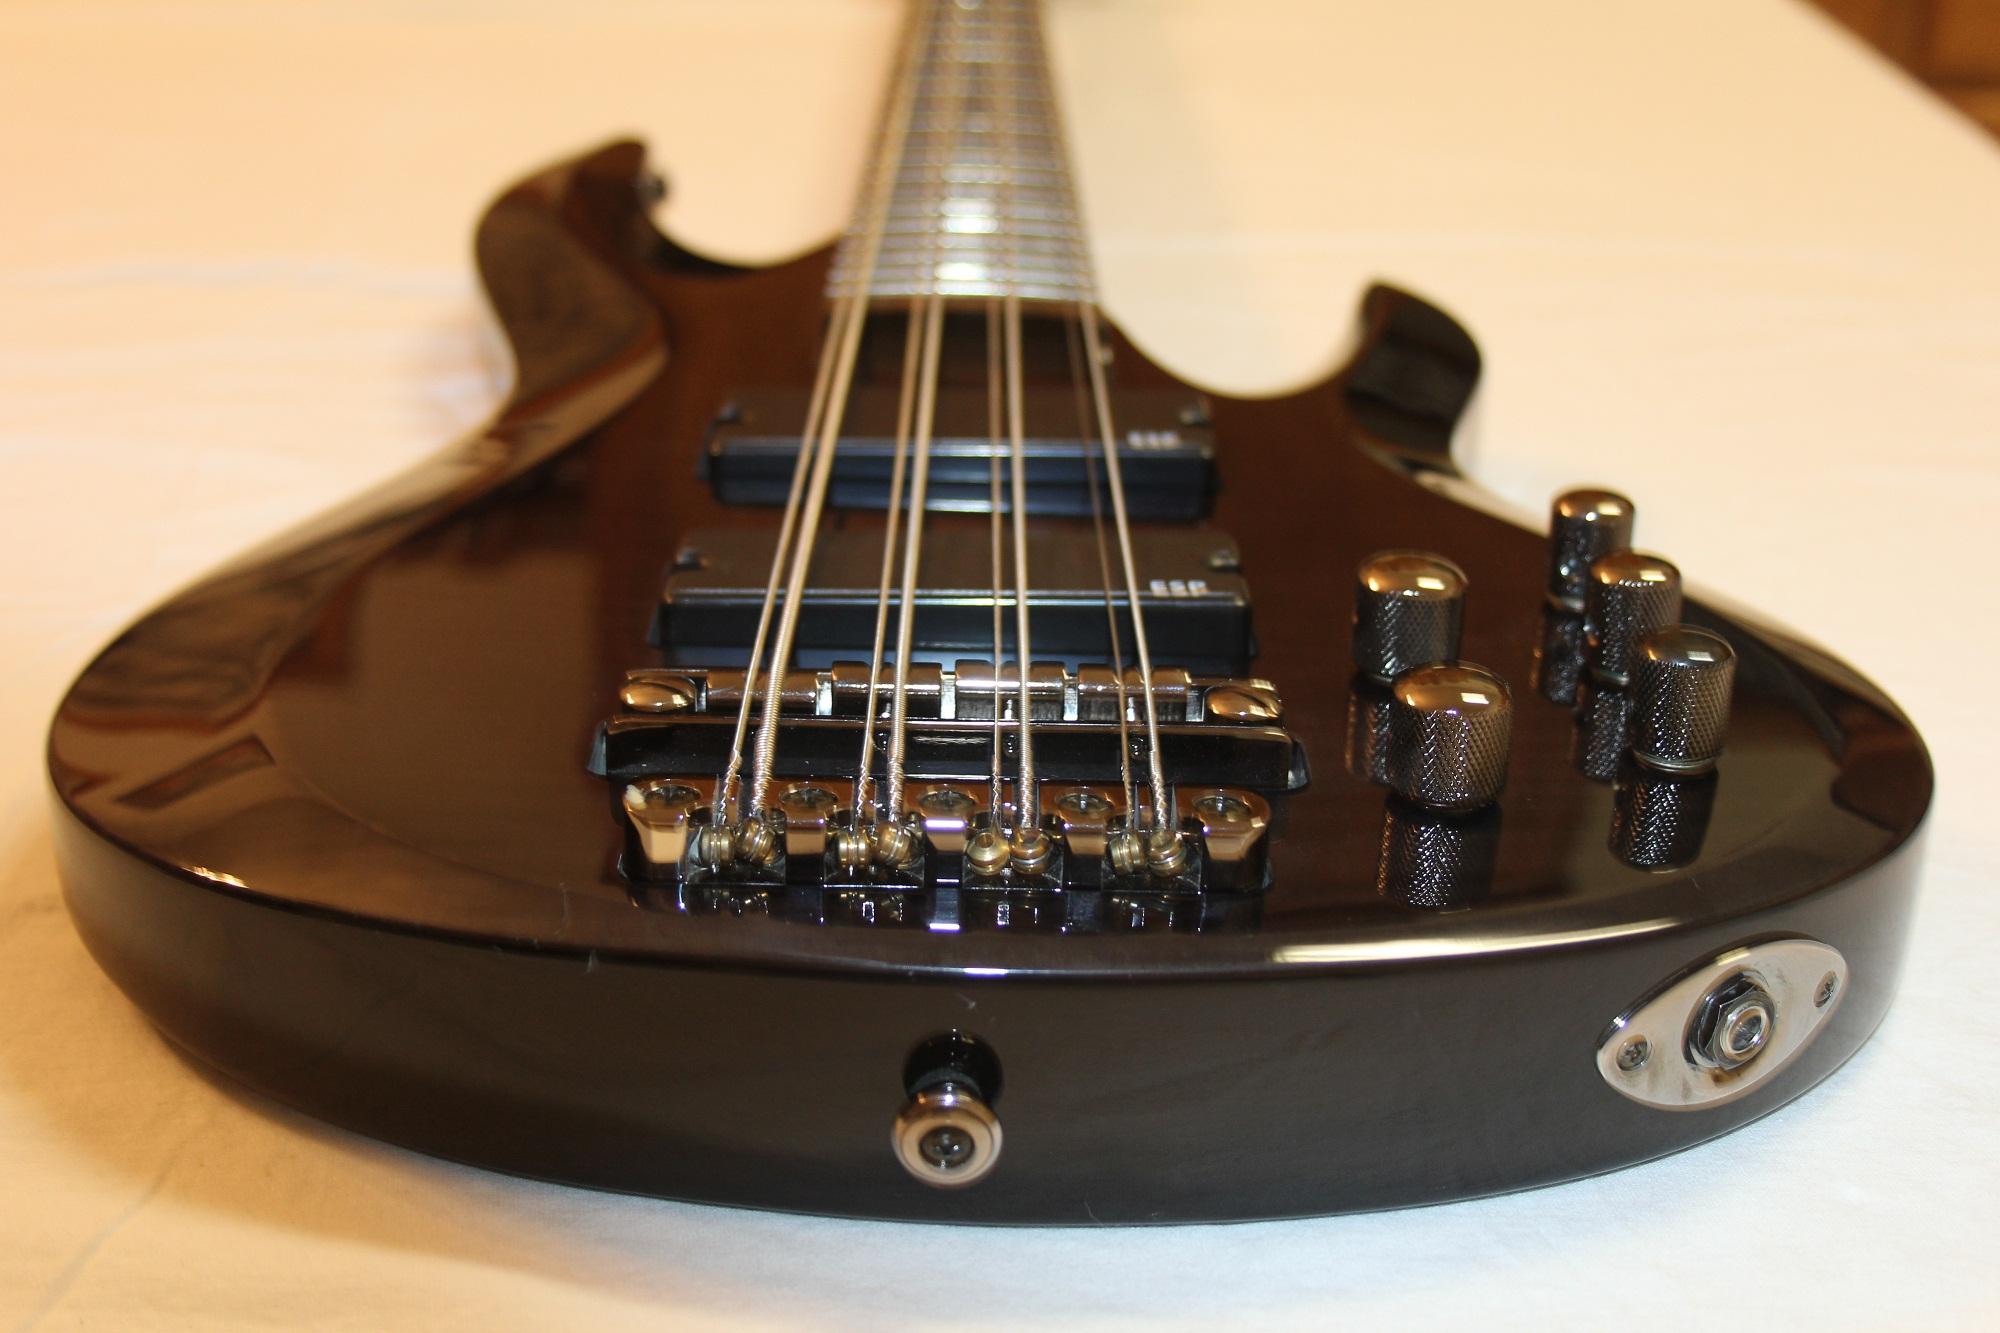 esp ltd b 208fm see thru black 8 string bass guitar 6. Black Bedroom Furniture Sets. Home Design Ideas